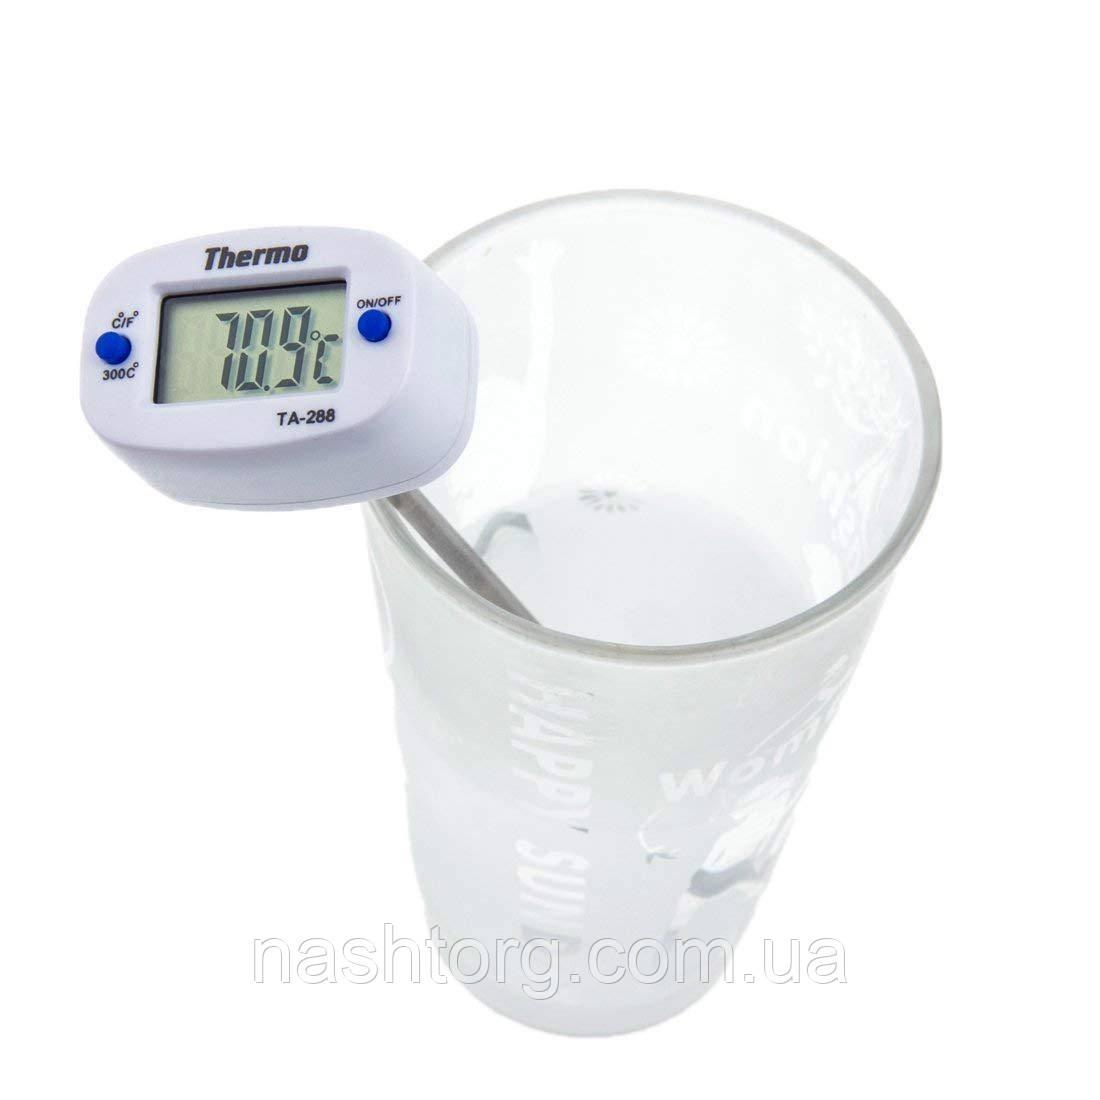 🔝 Кулинарный электронный термометр со щупом Thermo TA-288, Белый, с доставкой по Укриане   🎁%🚚